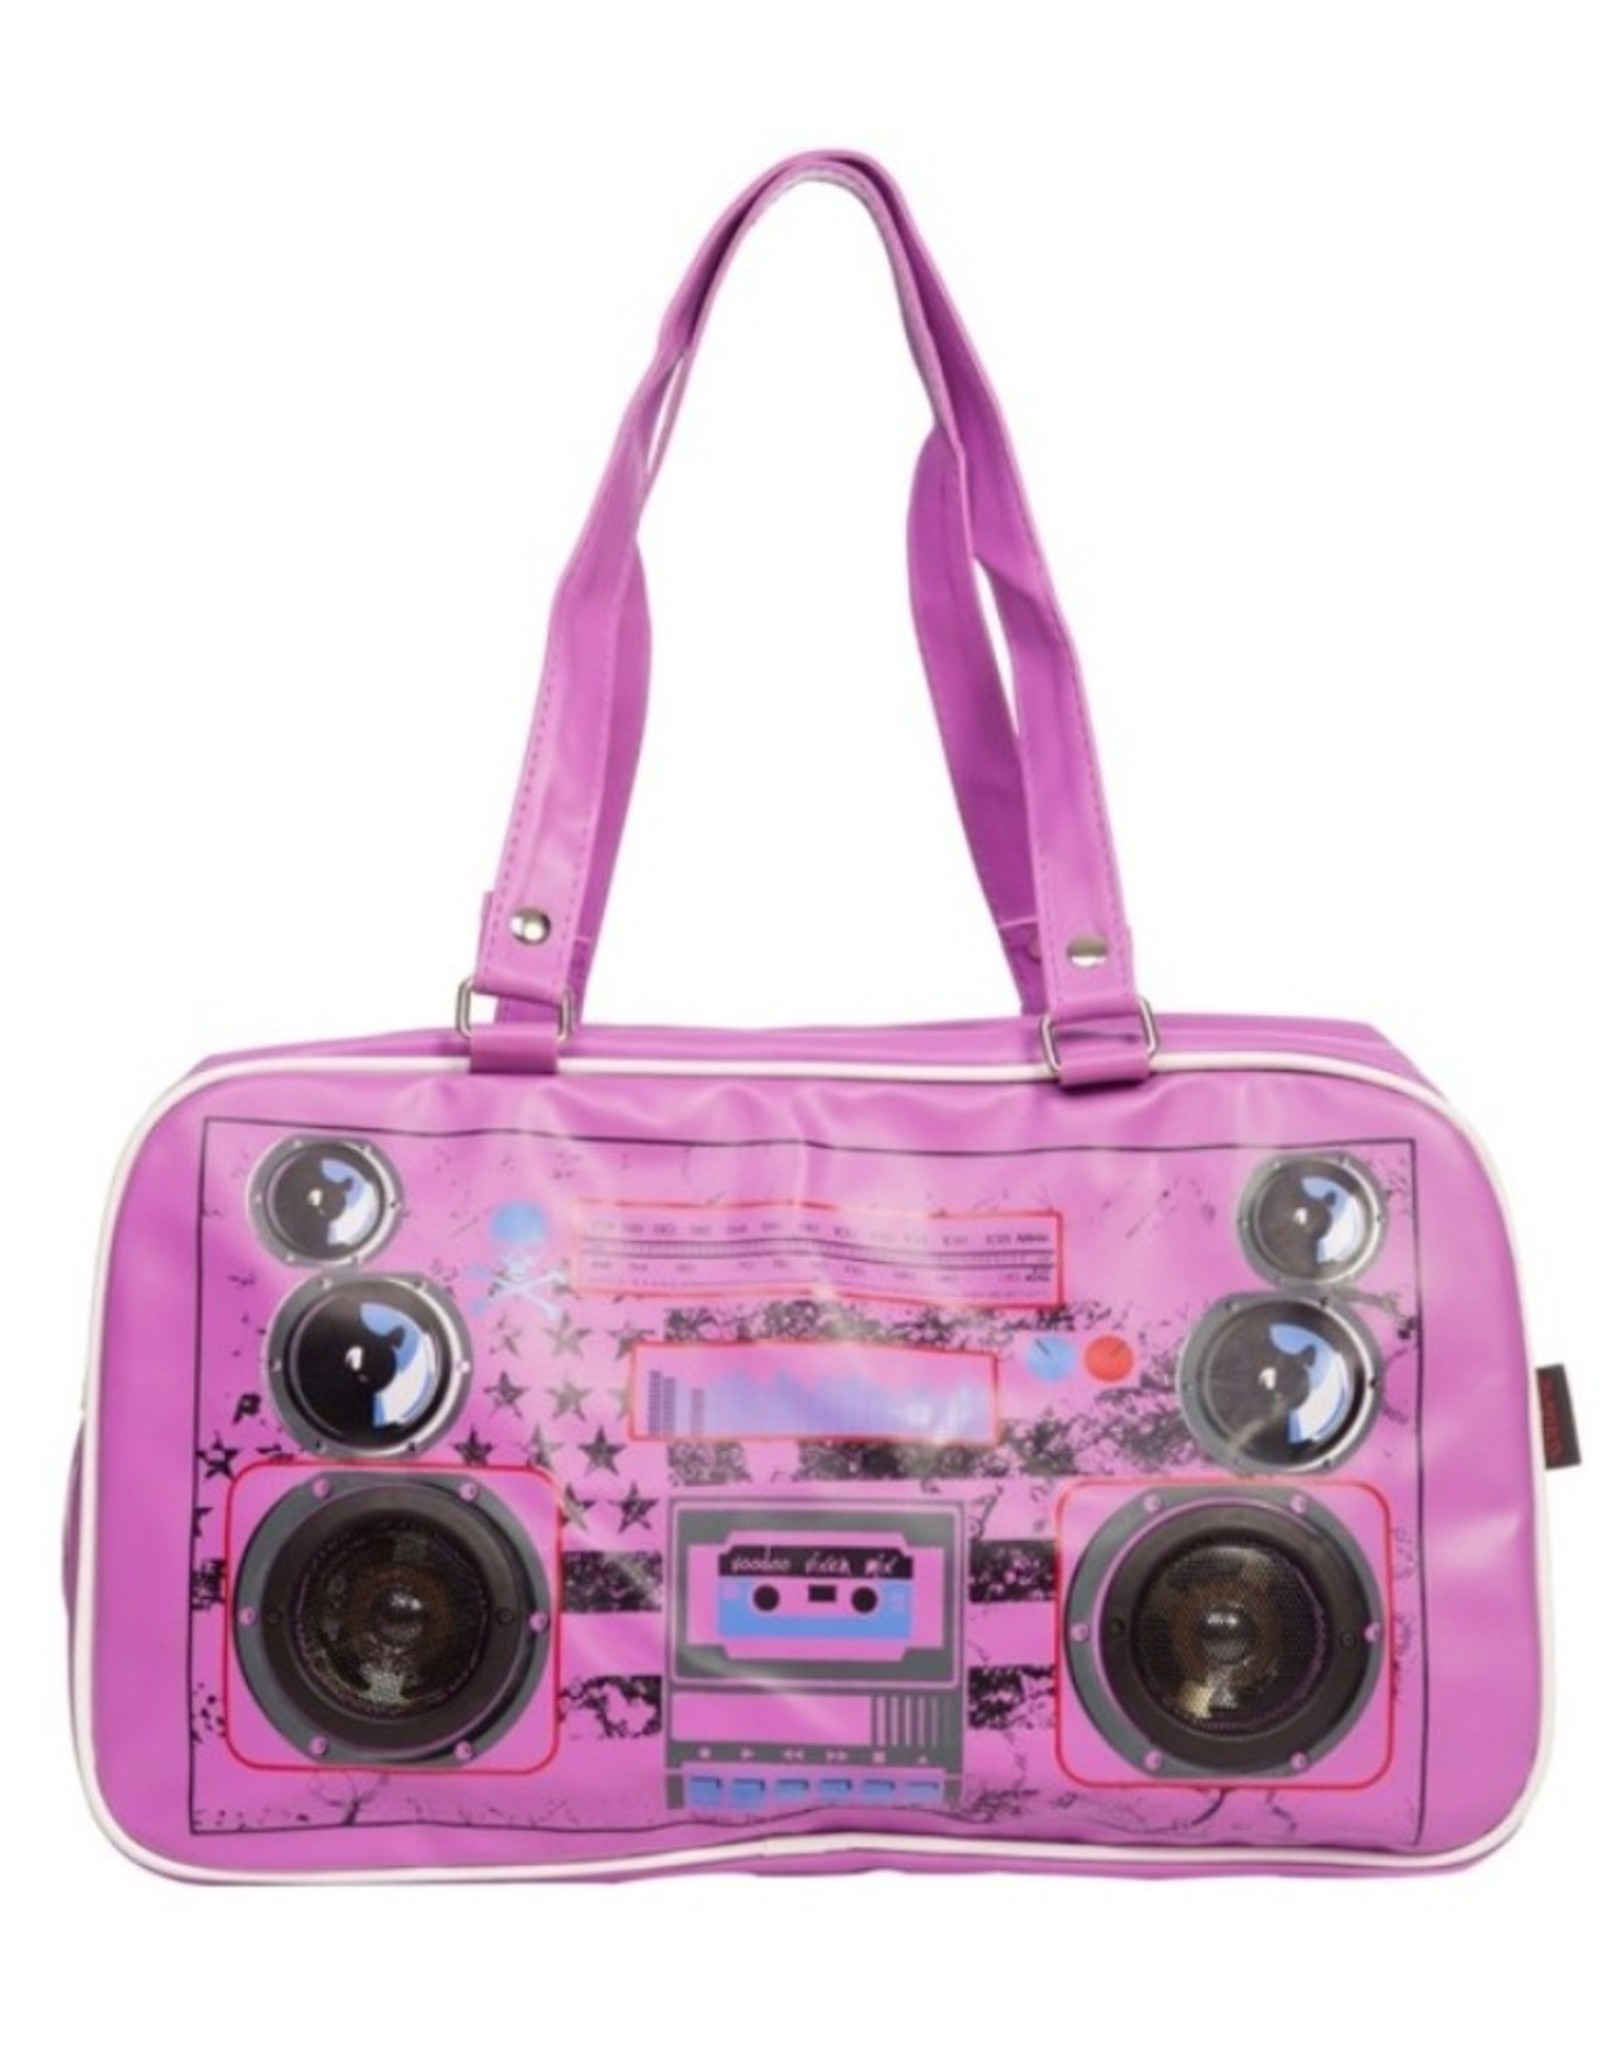 Jawbreaker Vintage tassen retro tassen -  Boombox Yankee schoudertas stereo